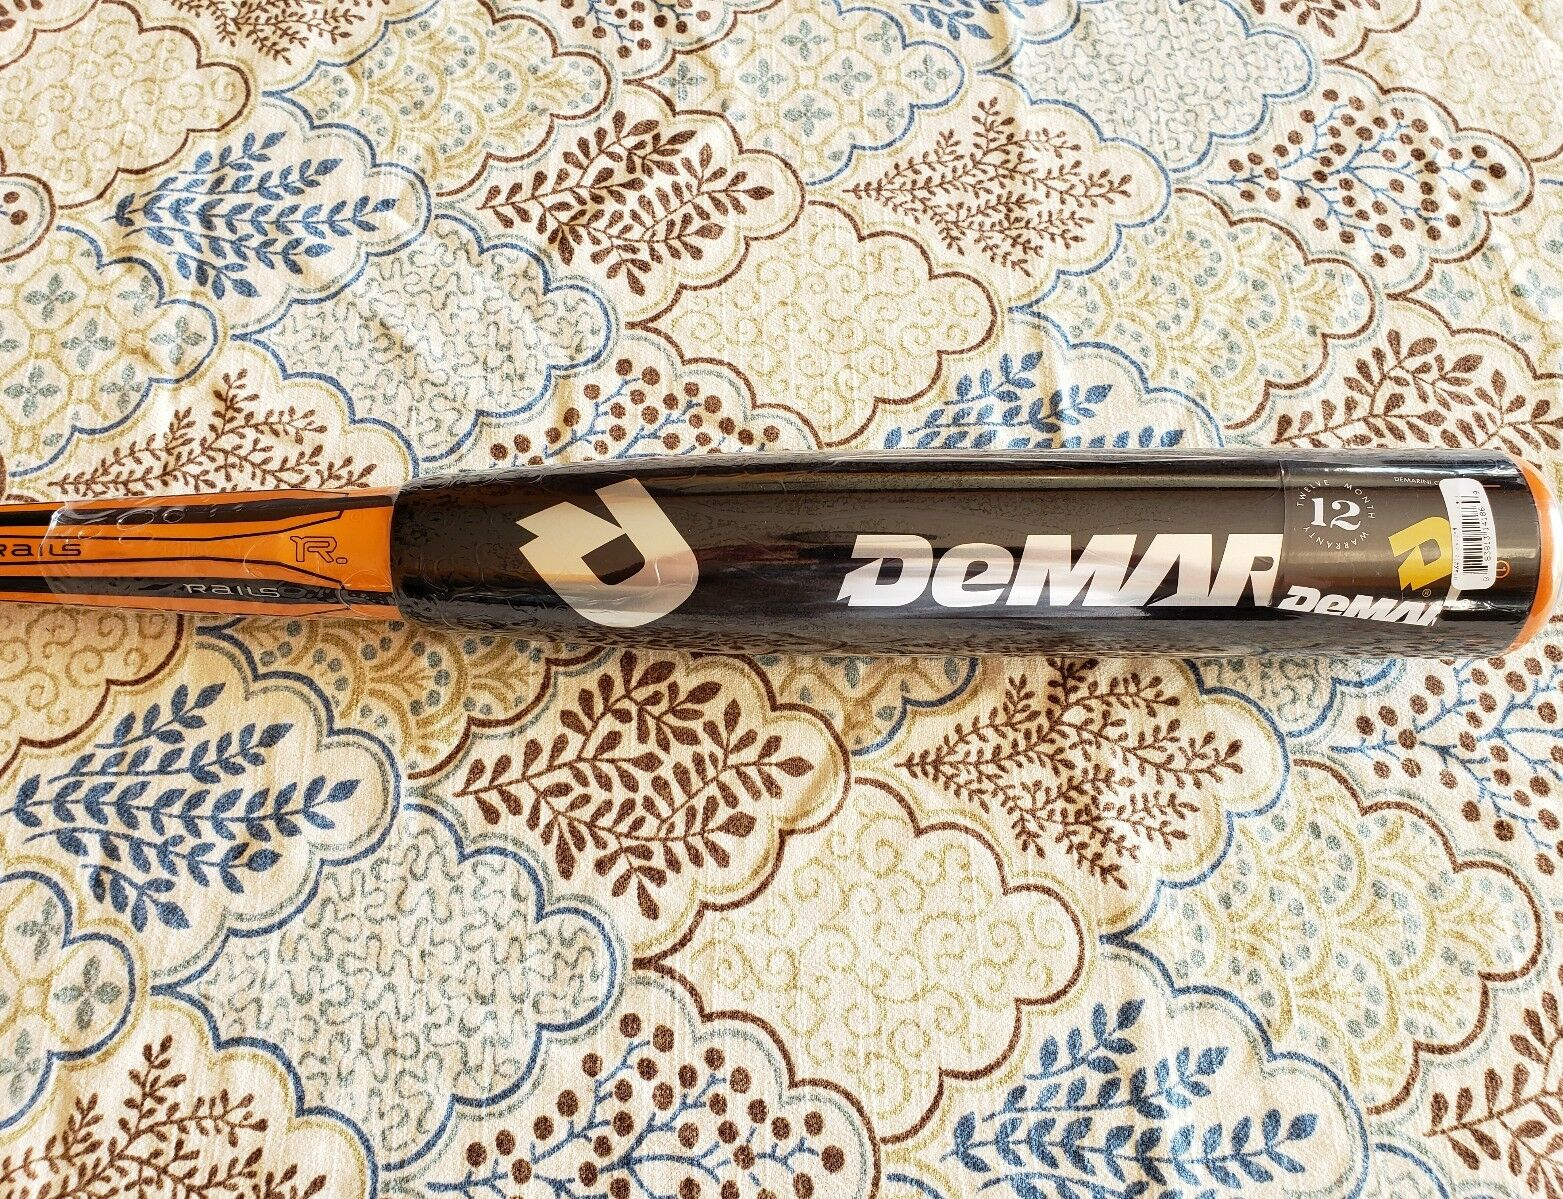 Demarini Vendetta rieles 32 29 -3, Besr bate de béisbol negro naranja.